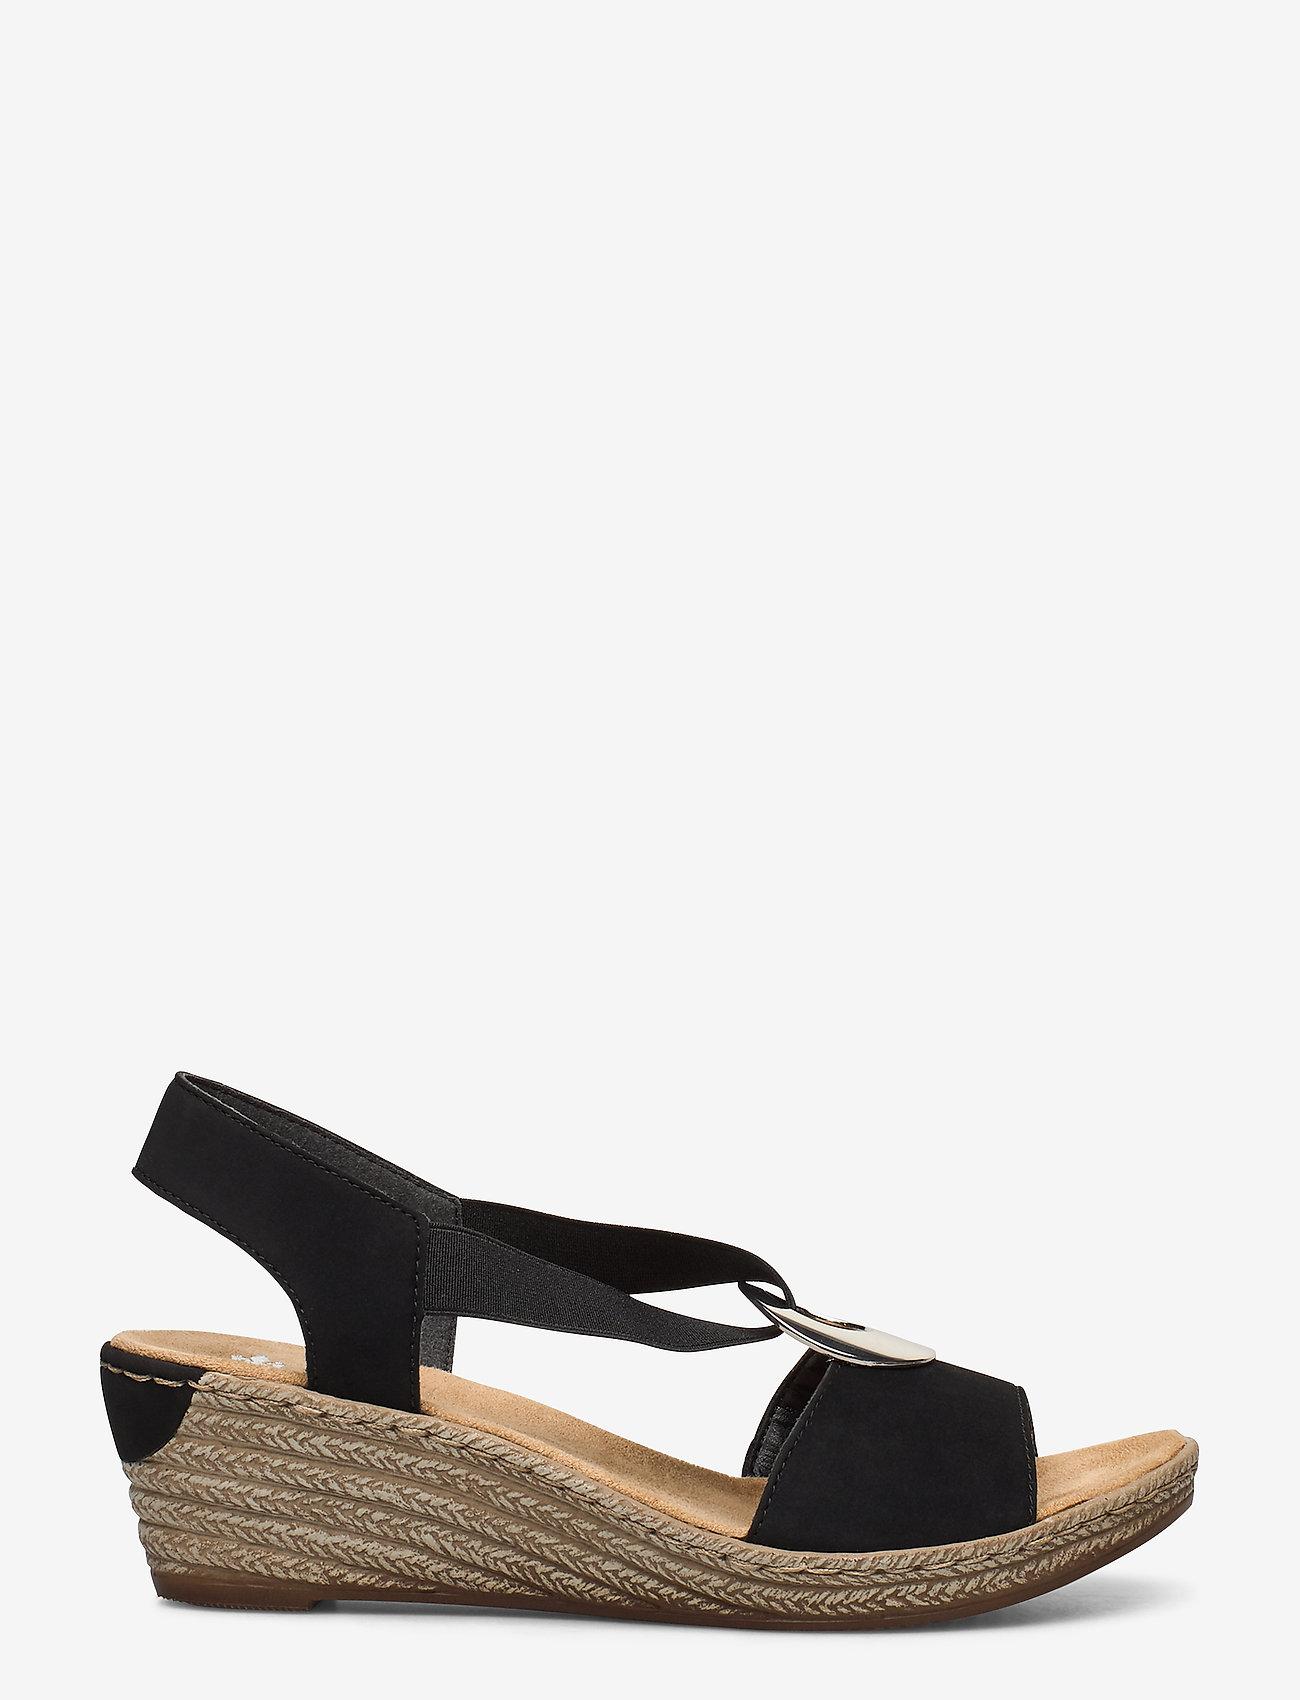 Rieker - 624H6-00 - heeled espadrilles - black